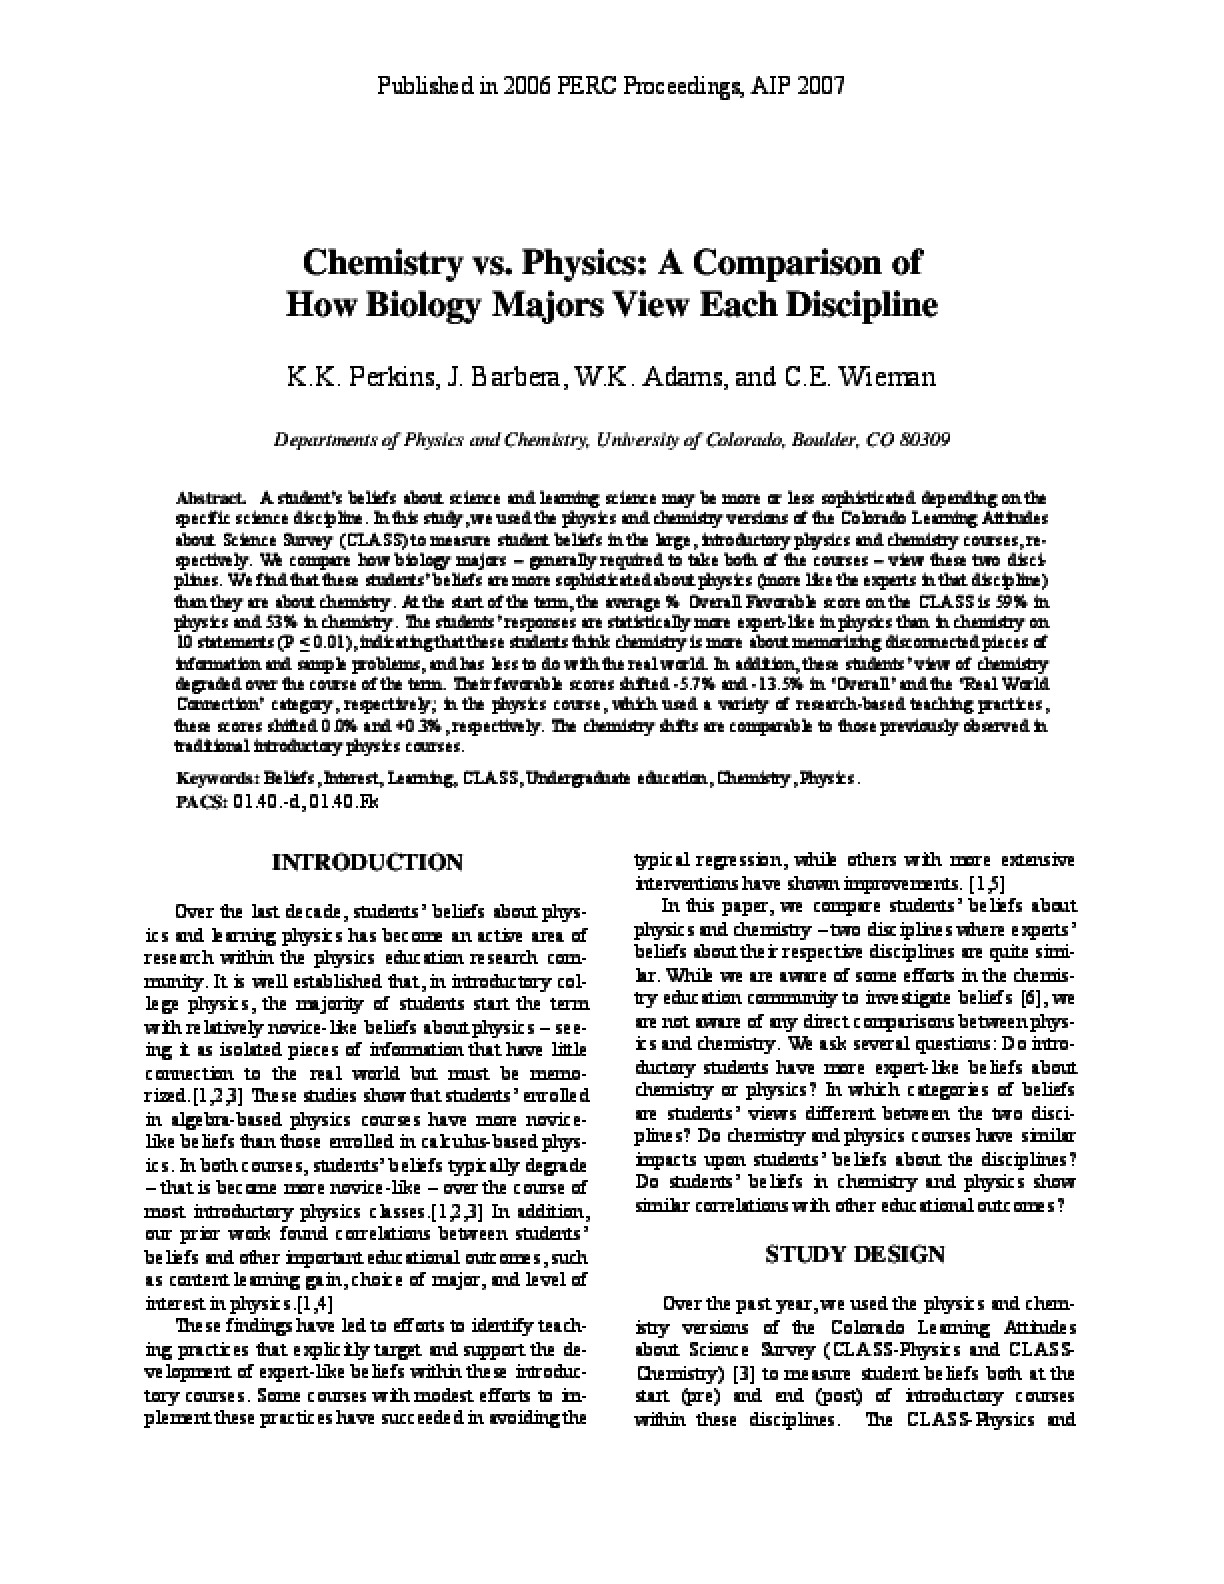 Chemistry vs. Physics: A Comparison of How Biology Majors View Each Discipline